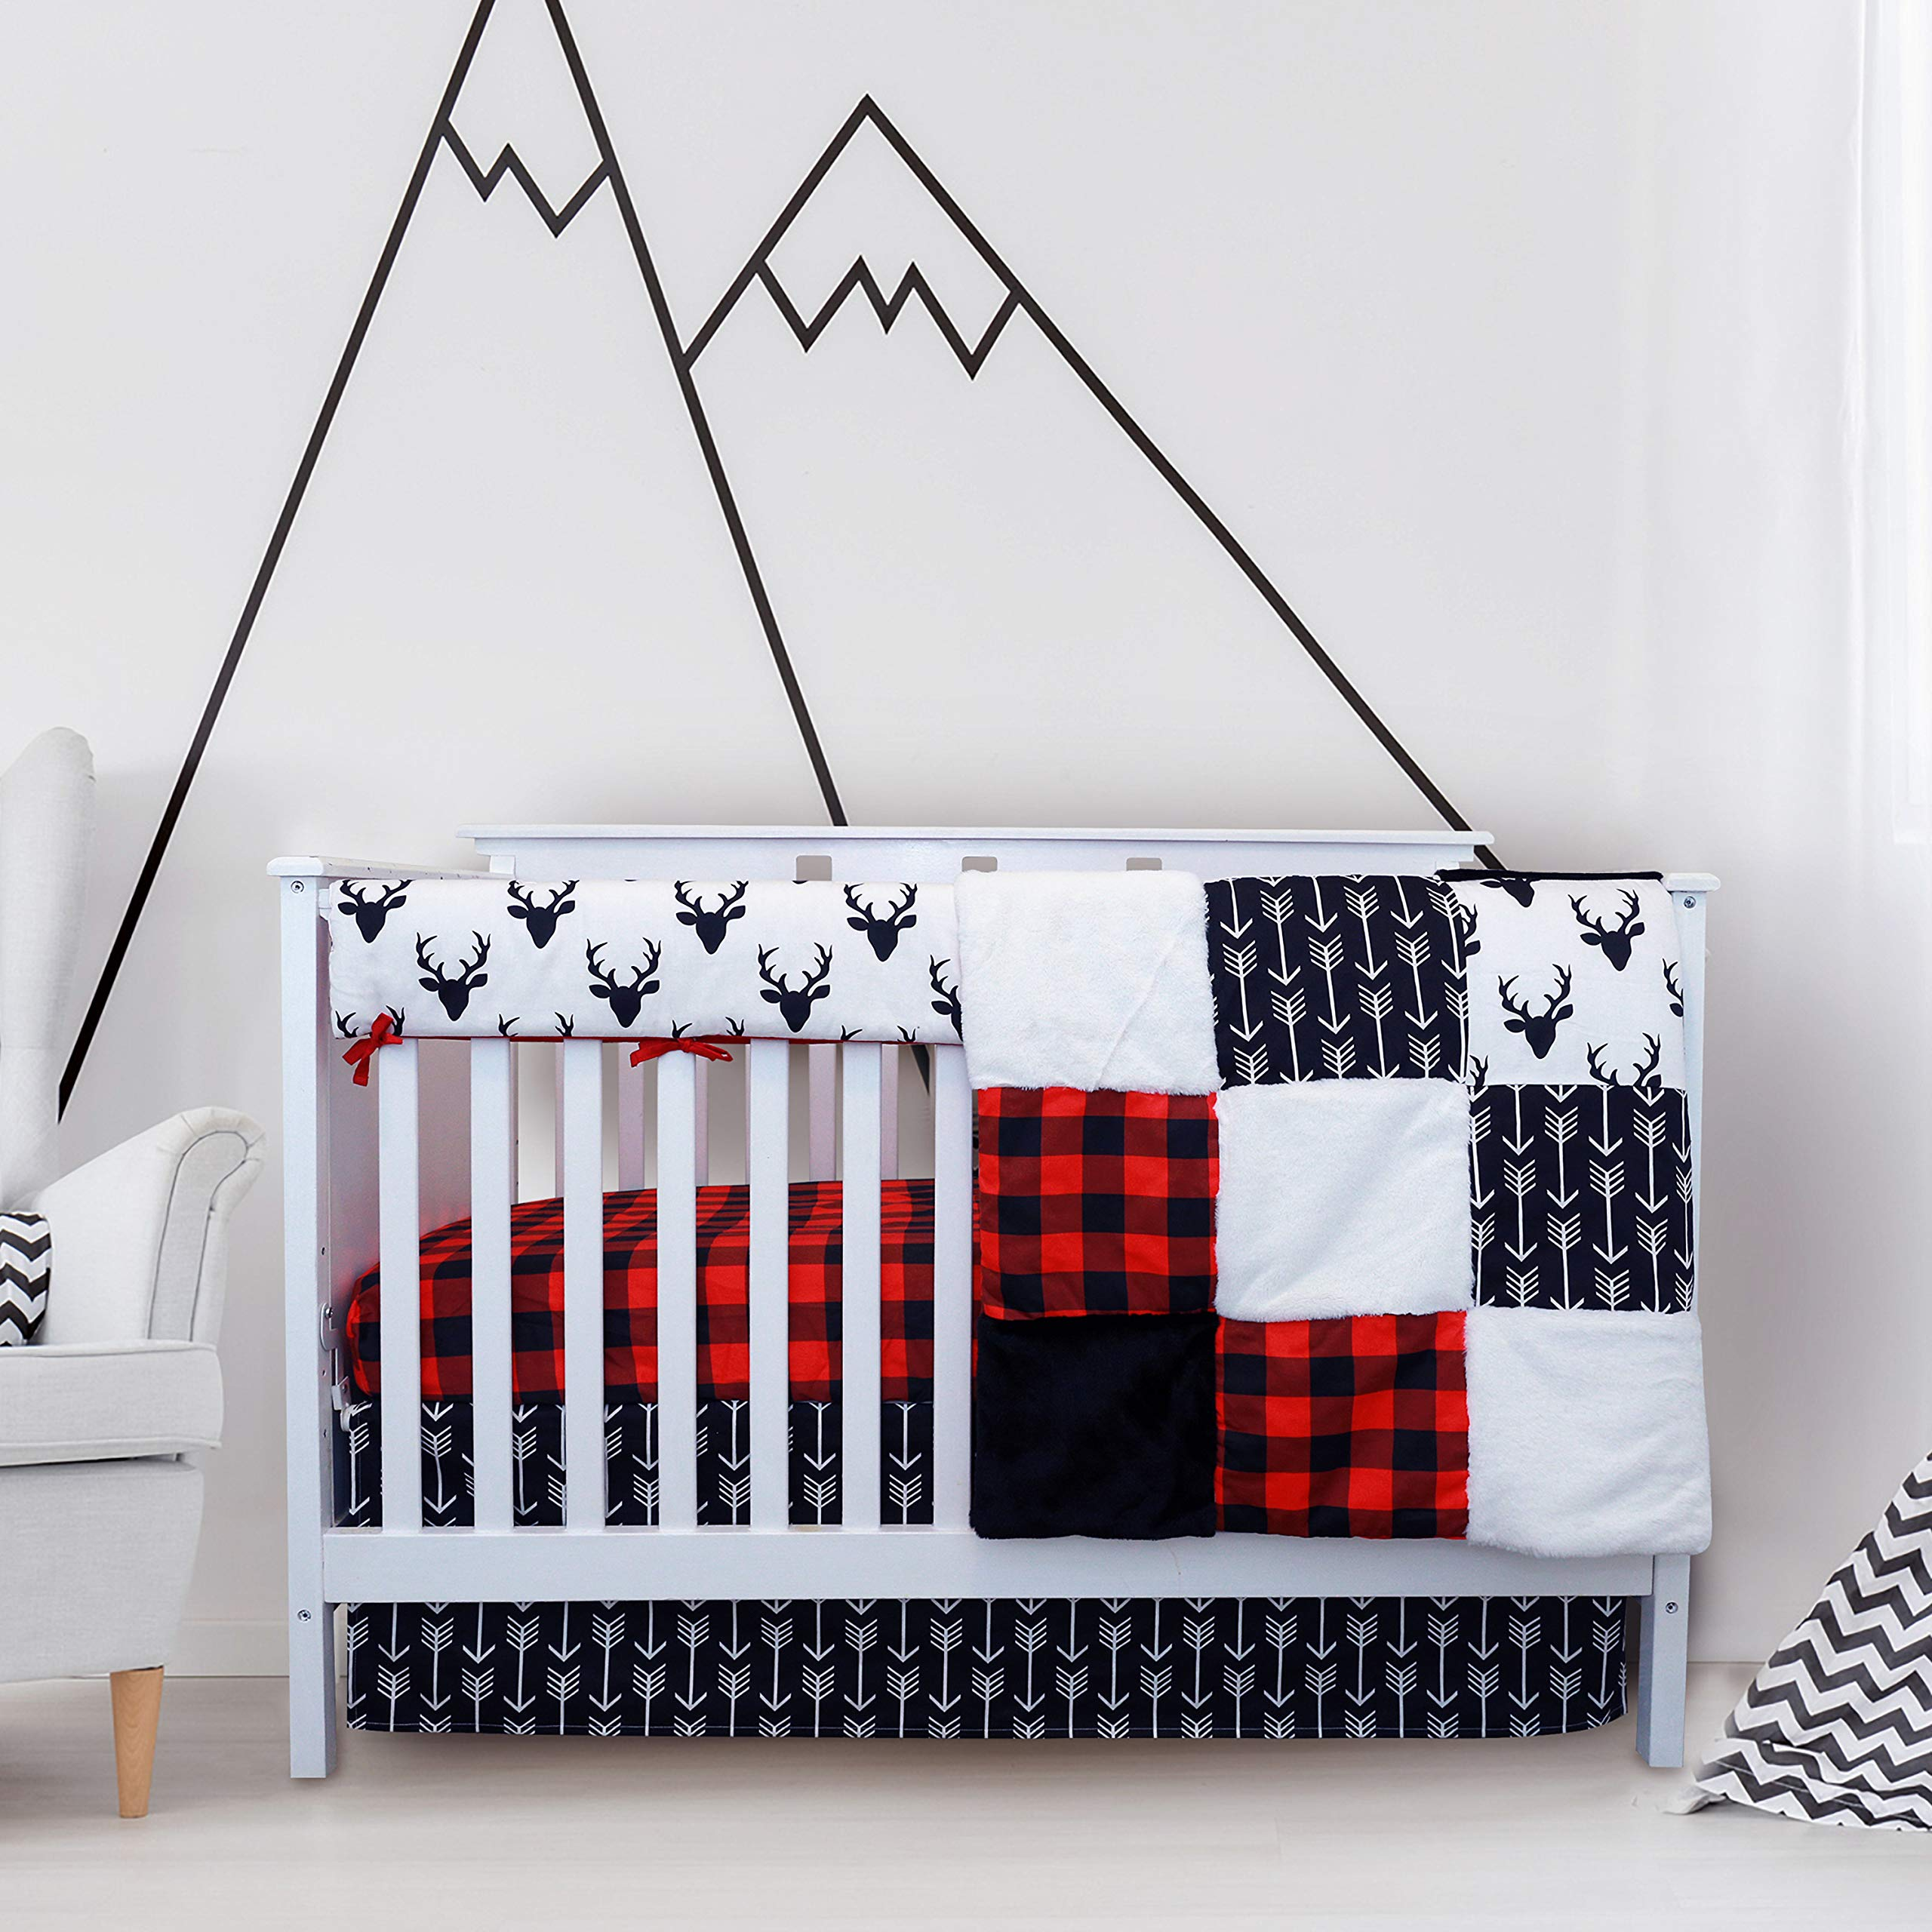 Crib Bedding Sets for Boys - 4 Piece Woodland Set for Baby boy Rustic Nursery Decor   Quilt Blanket, Crib Sheet, Skirt and Rail Cover   Deer Antler, Arrow Buffalo Plaid (Woodland Deer) by JLIKA